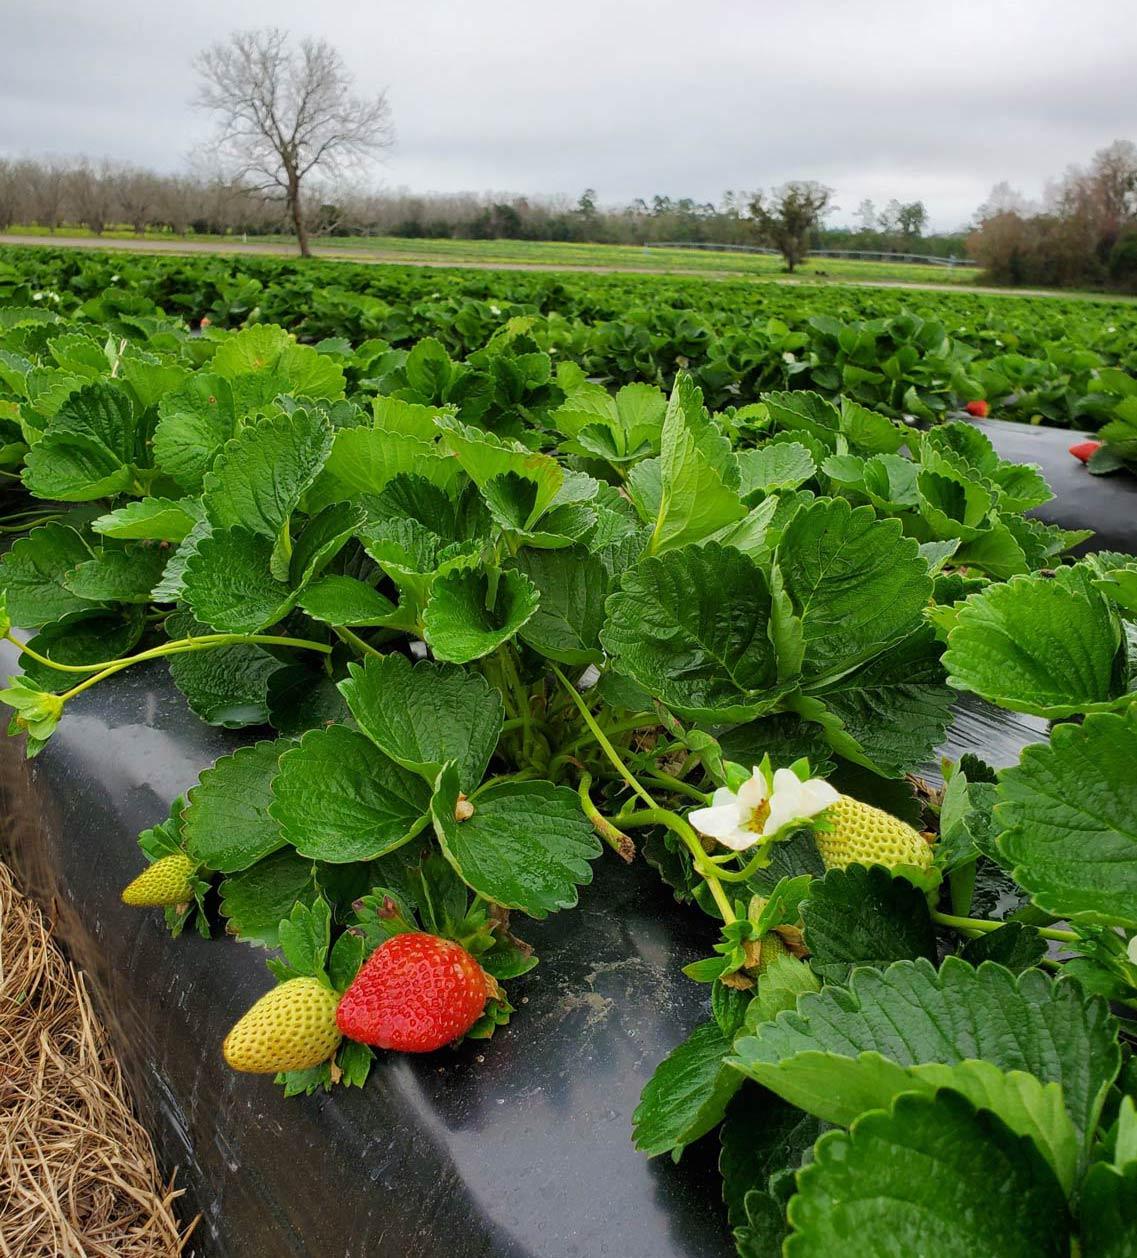 Repining strawberries on a farm